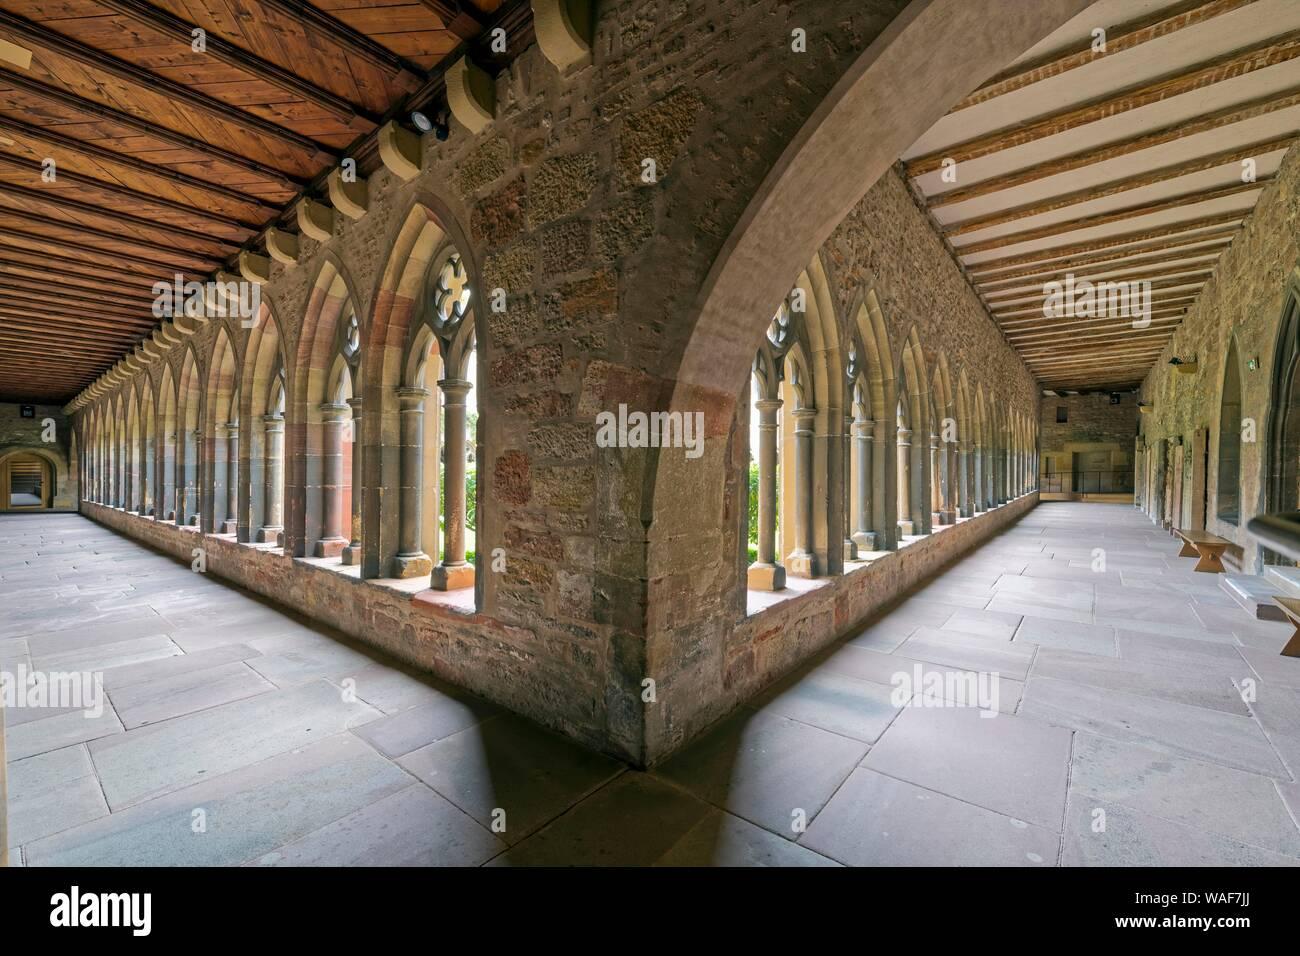 Cloister, Museum Unterlinden, Colmar, Alsace, France Stock Photo